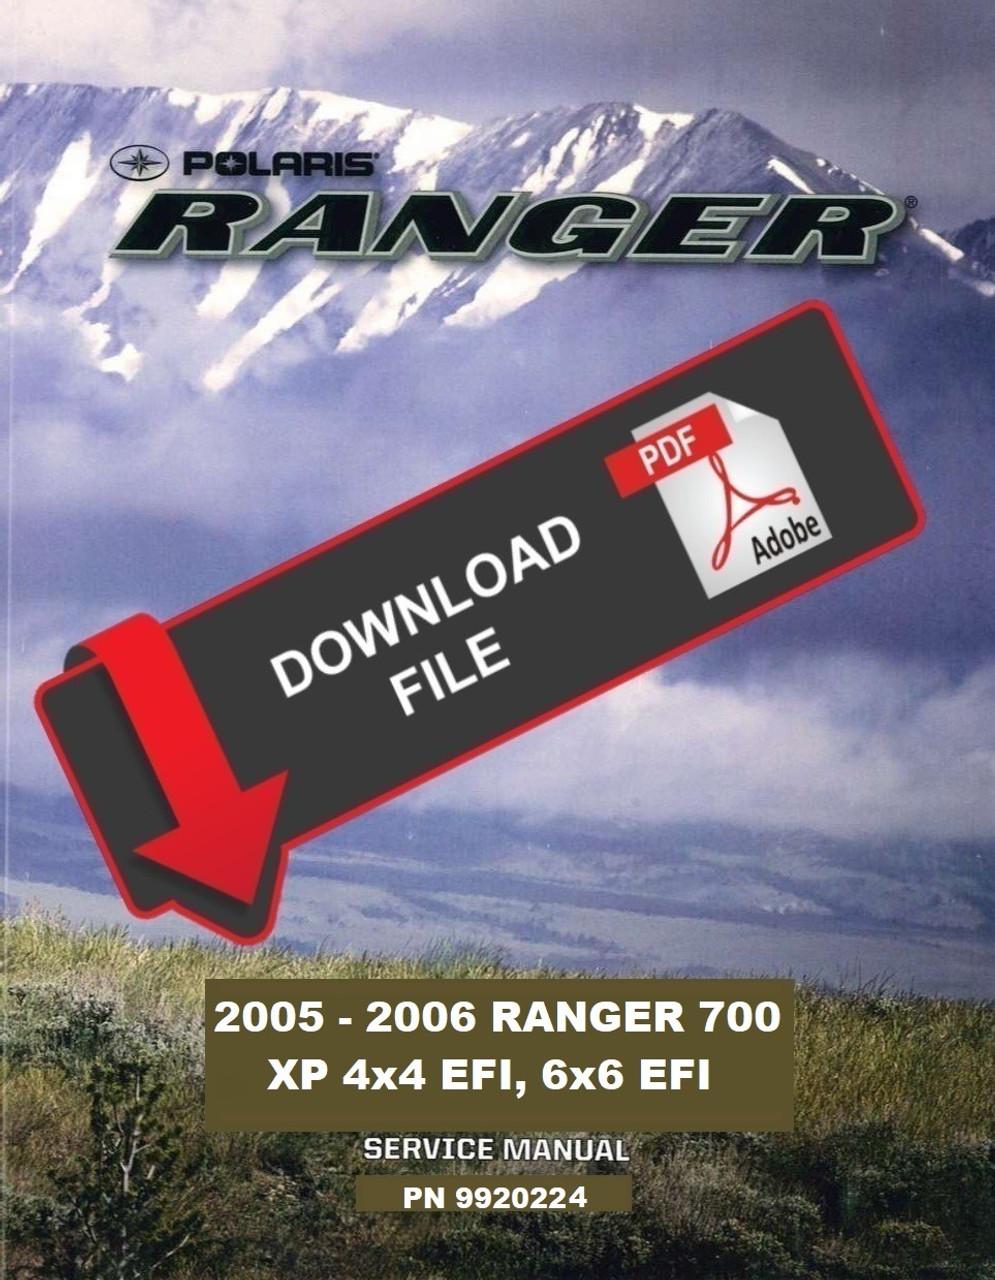 medium resolution of  polaris 2005 ranger xp 4x4 service manual on polaris ranger rzr 800 kawasaki teryx 750